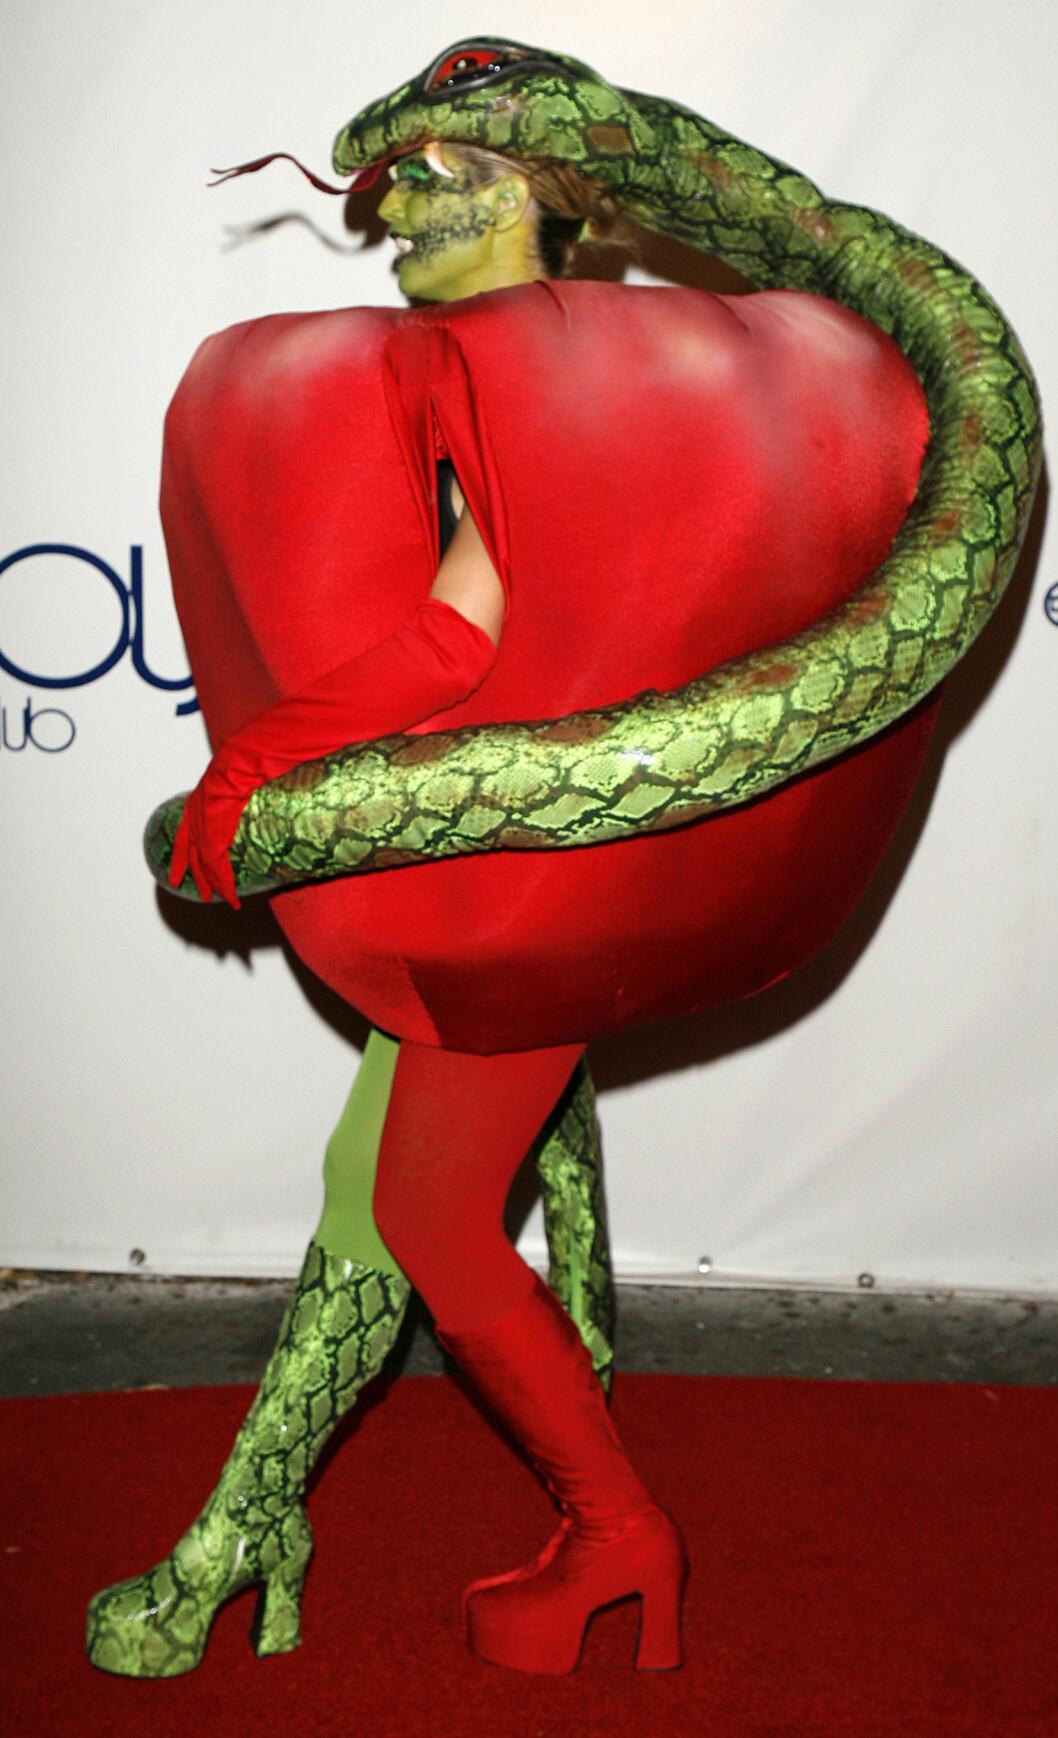 EDENS HAGE: Heidi Klum utkledd som et eple fra Edens hage. Foto: AP